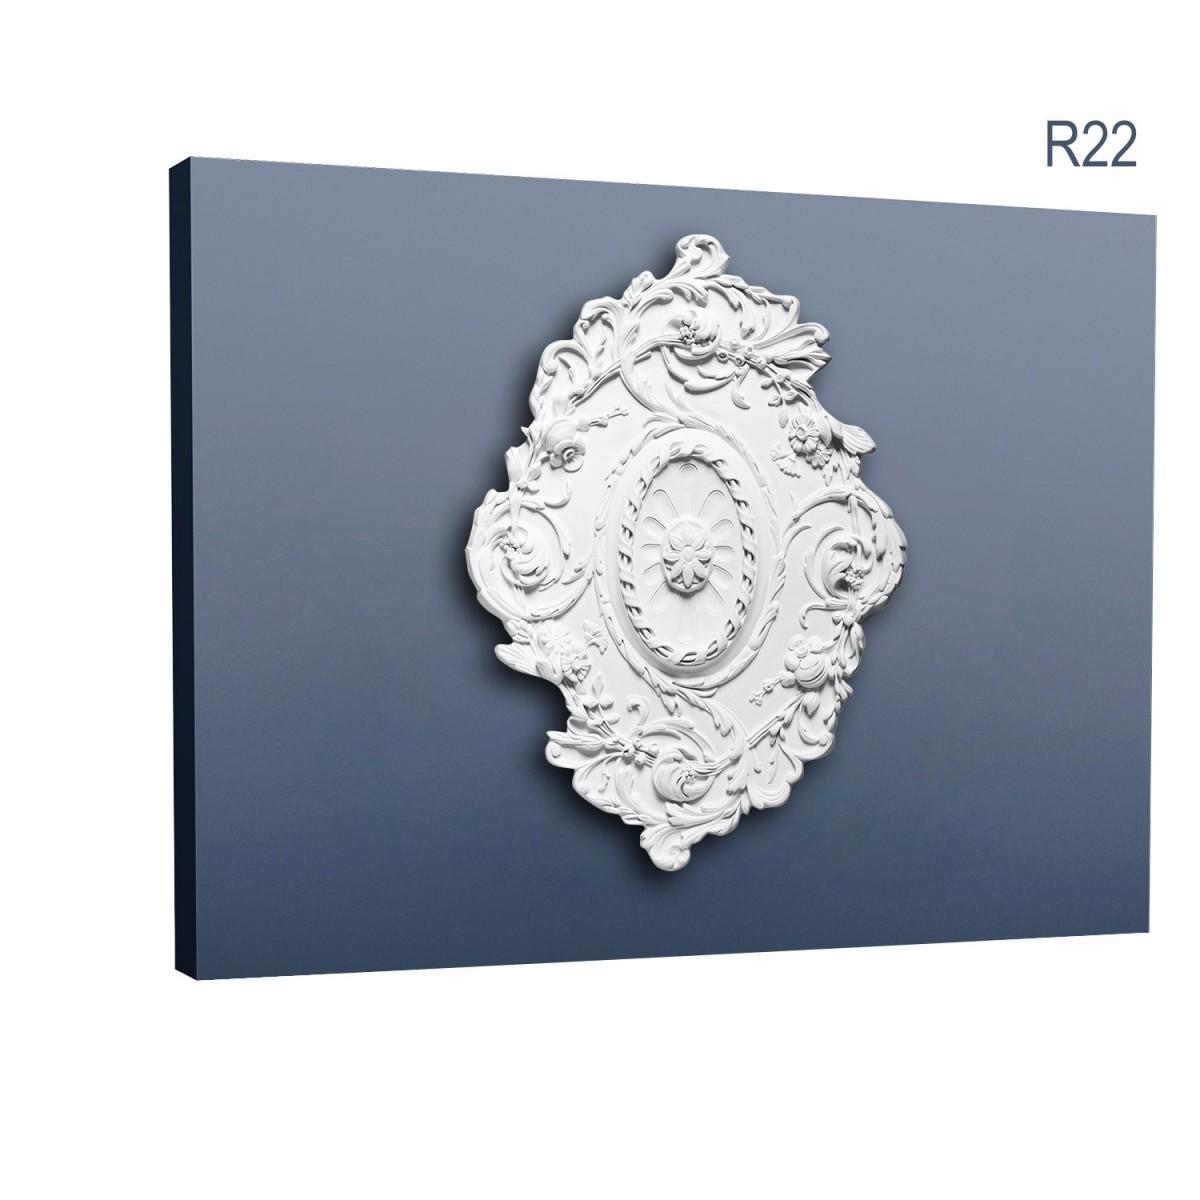 Rozeta Luxxus R22, Dimensiuni: 77.5 X 53 X 3.6 cm, Orac Decor